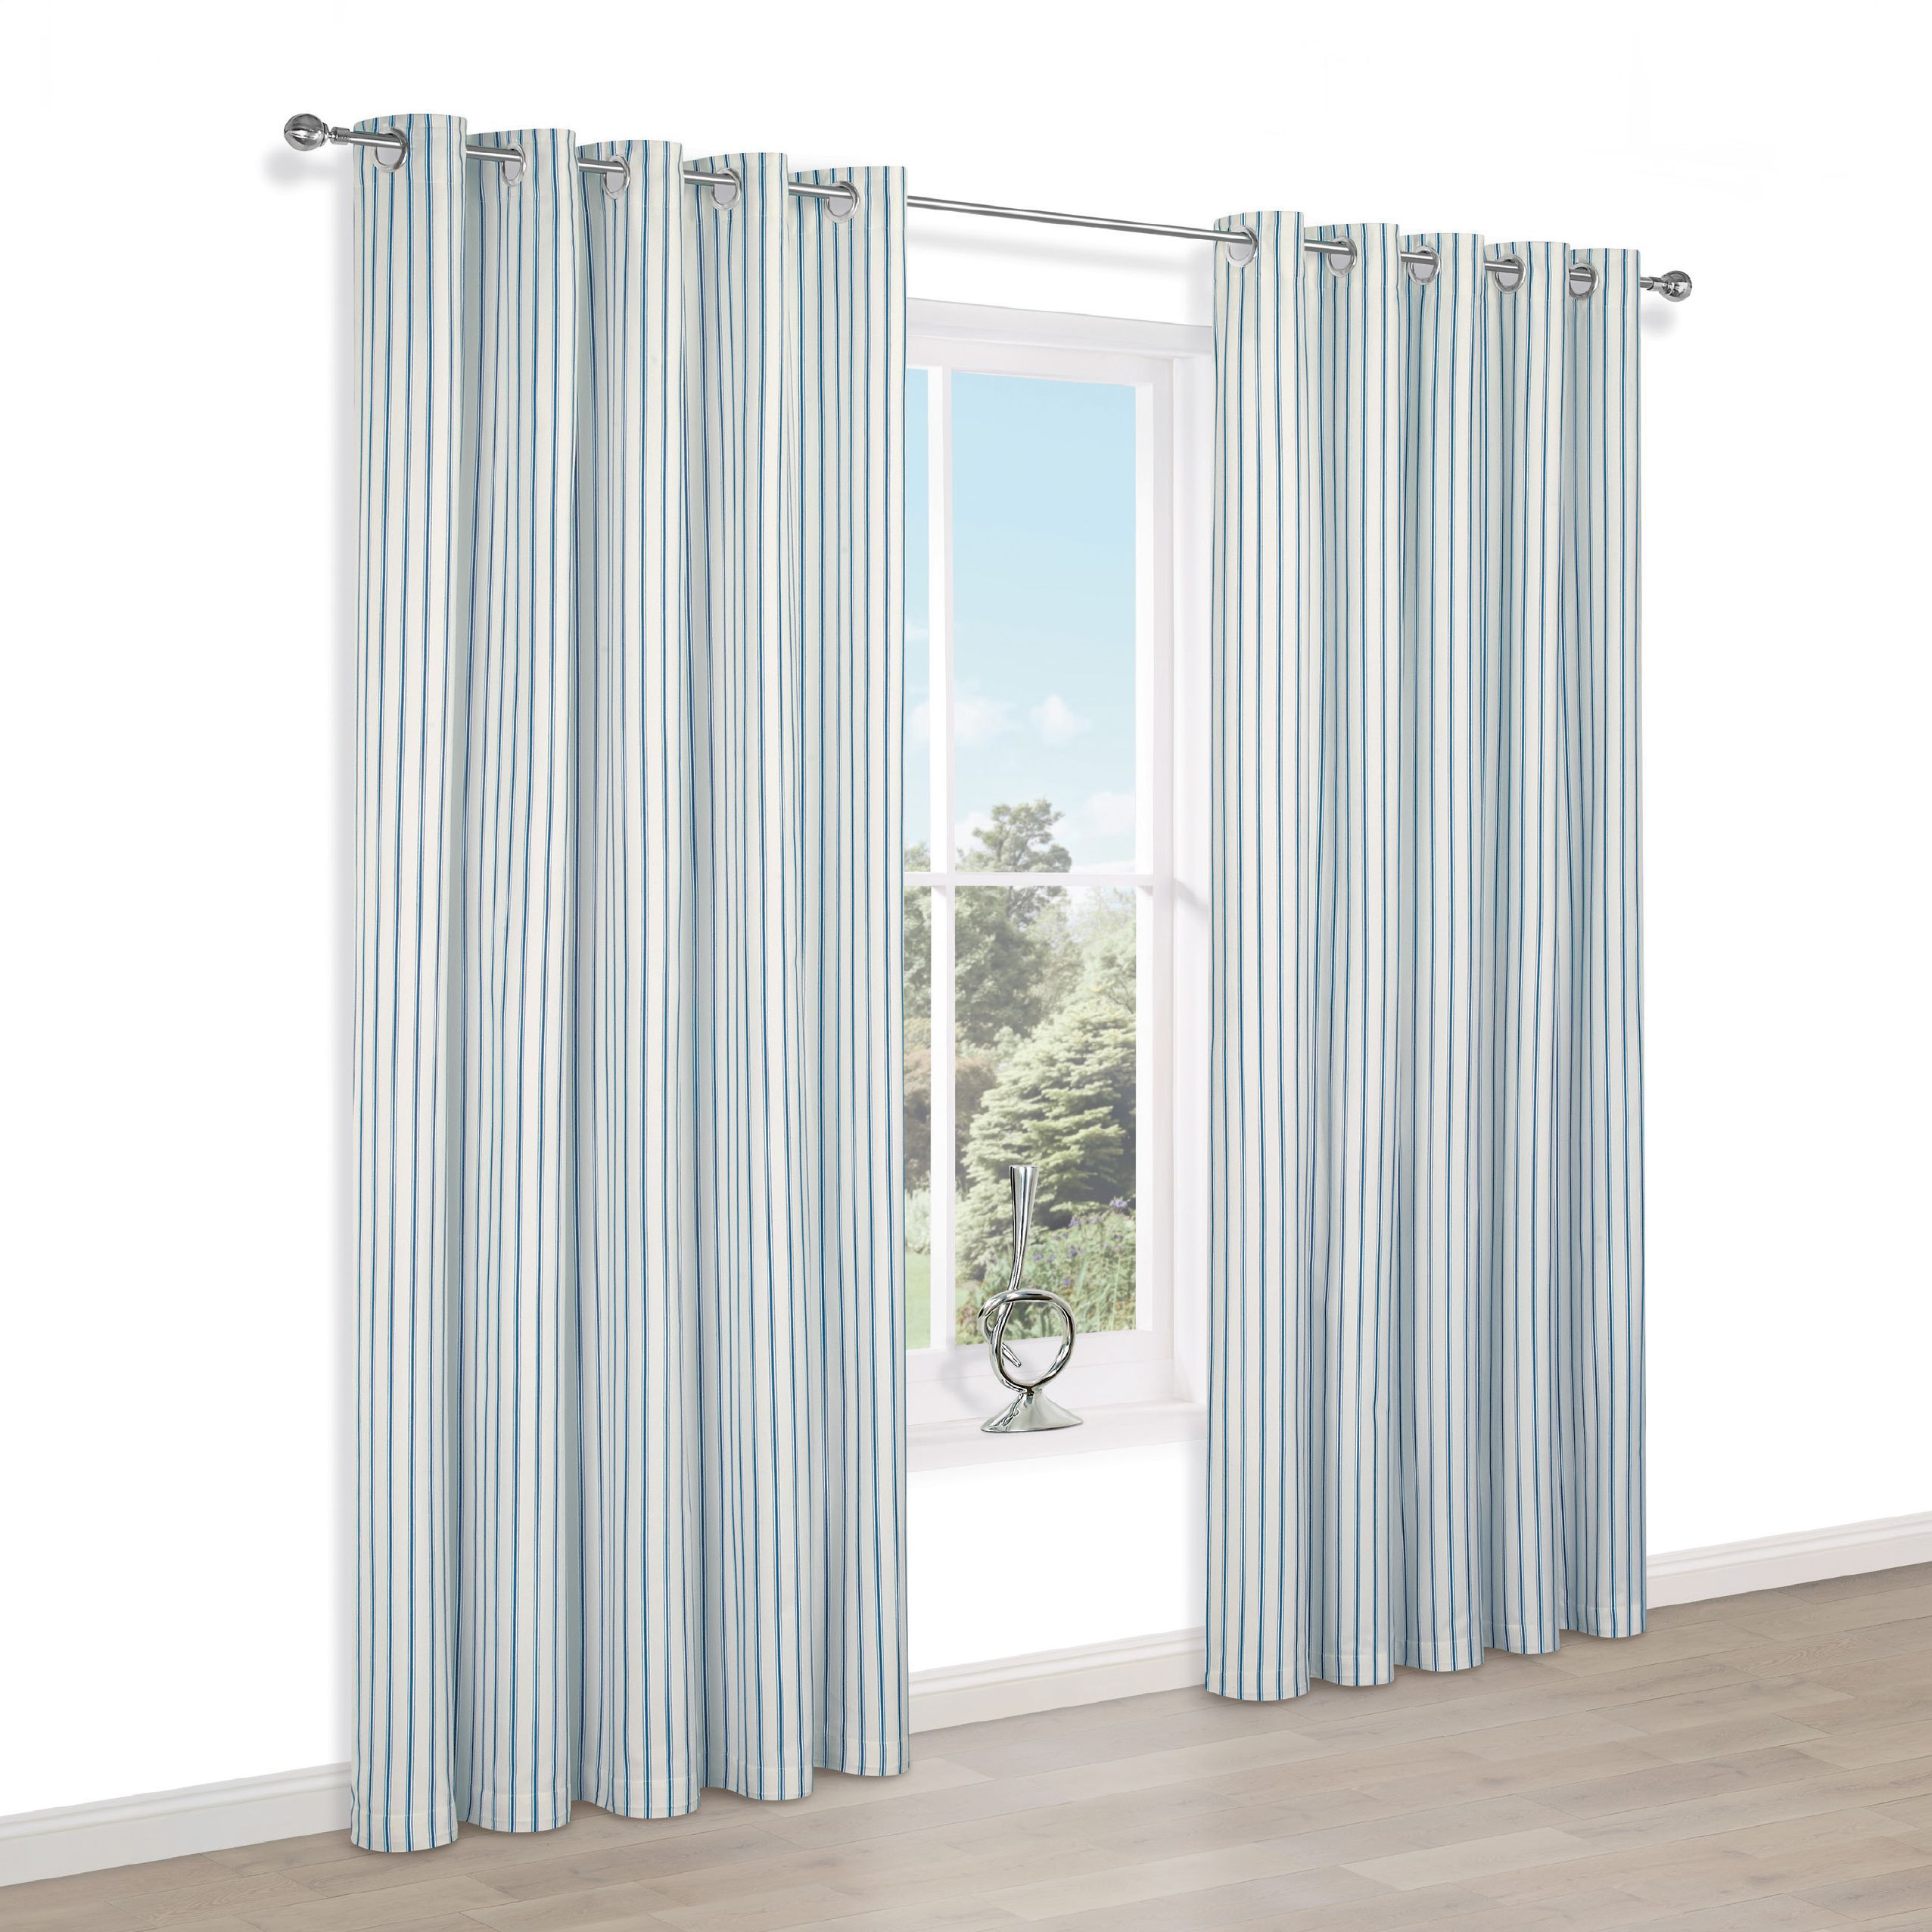 Christina Blue & White Stripe Eyelet Lined Curtains (w)228cm (l)228cm